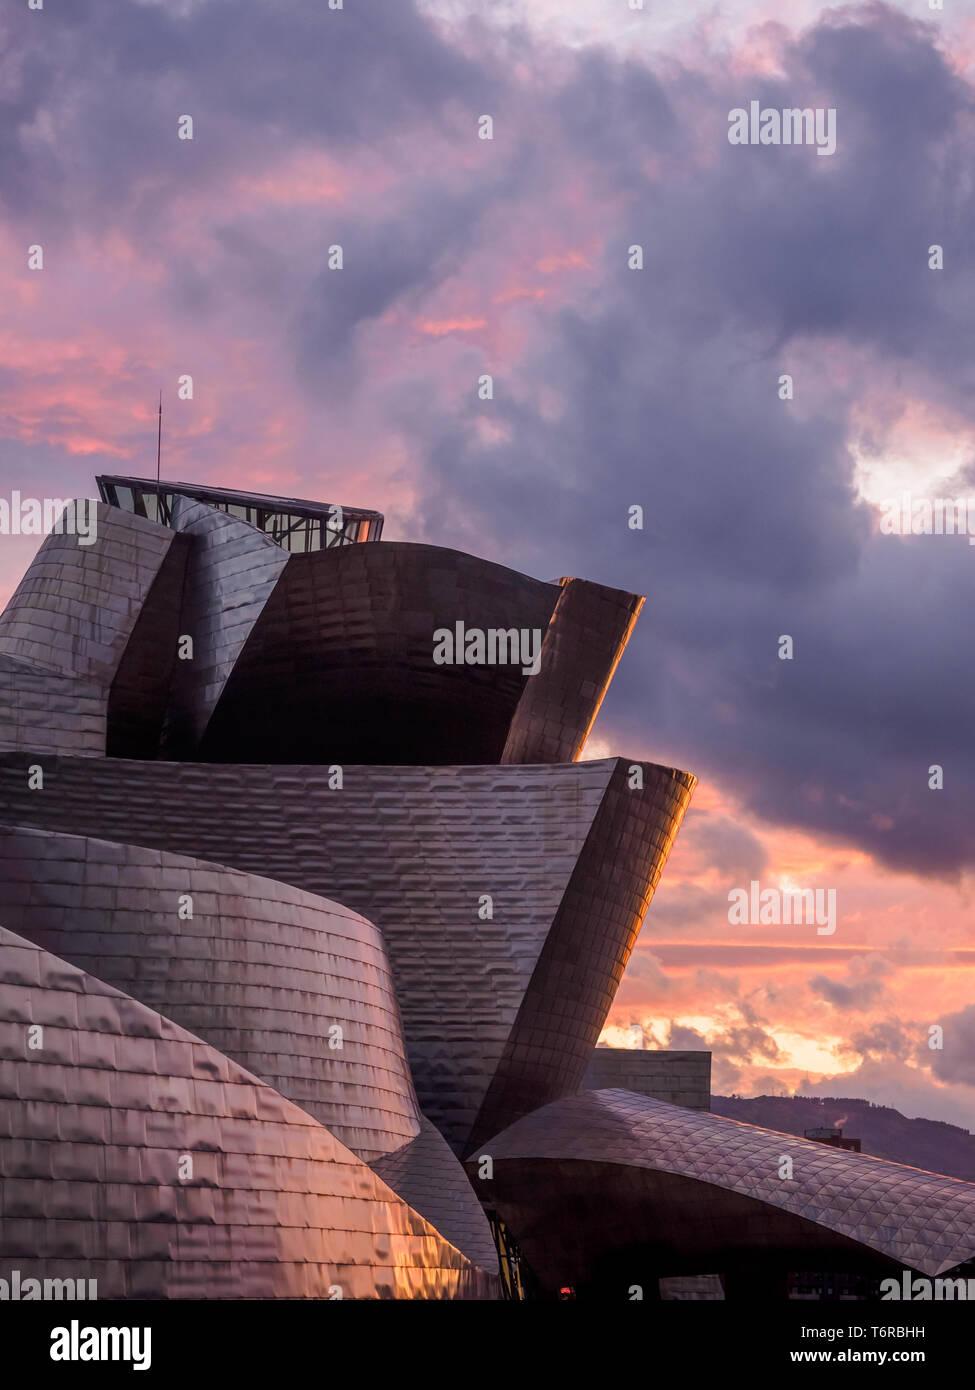 Bilbao riverside near Guggenheim Museum during the sunset, view from La salve bridge - Stock Image